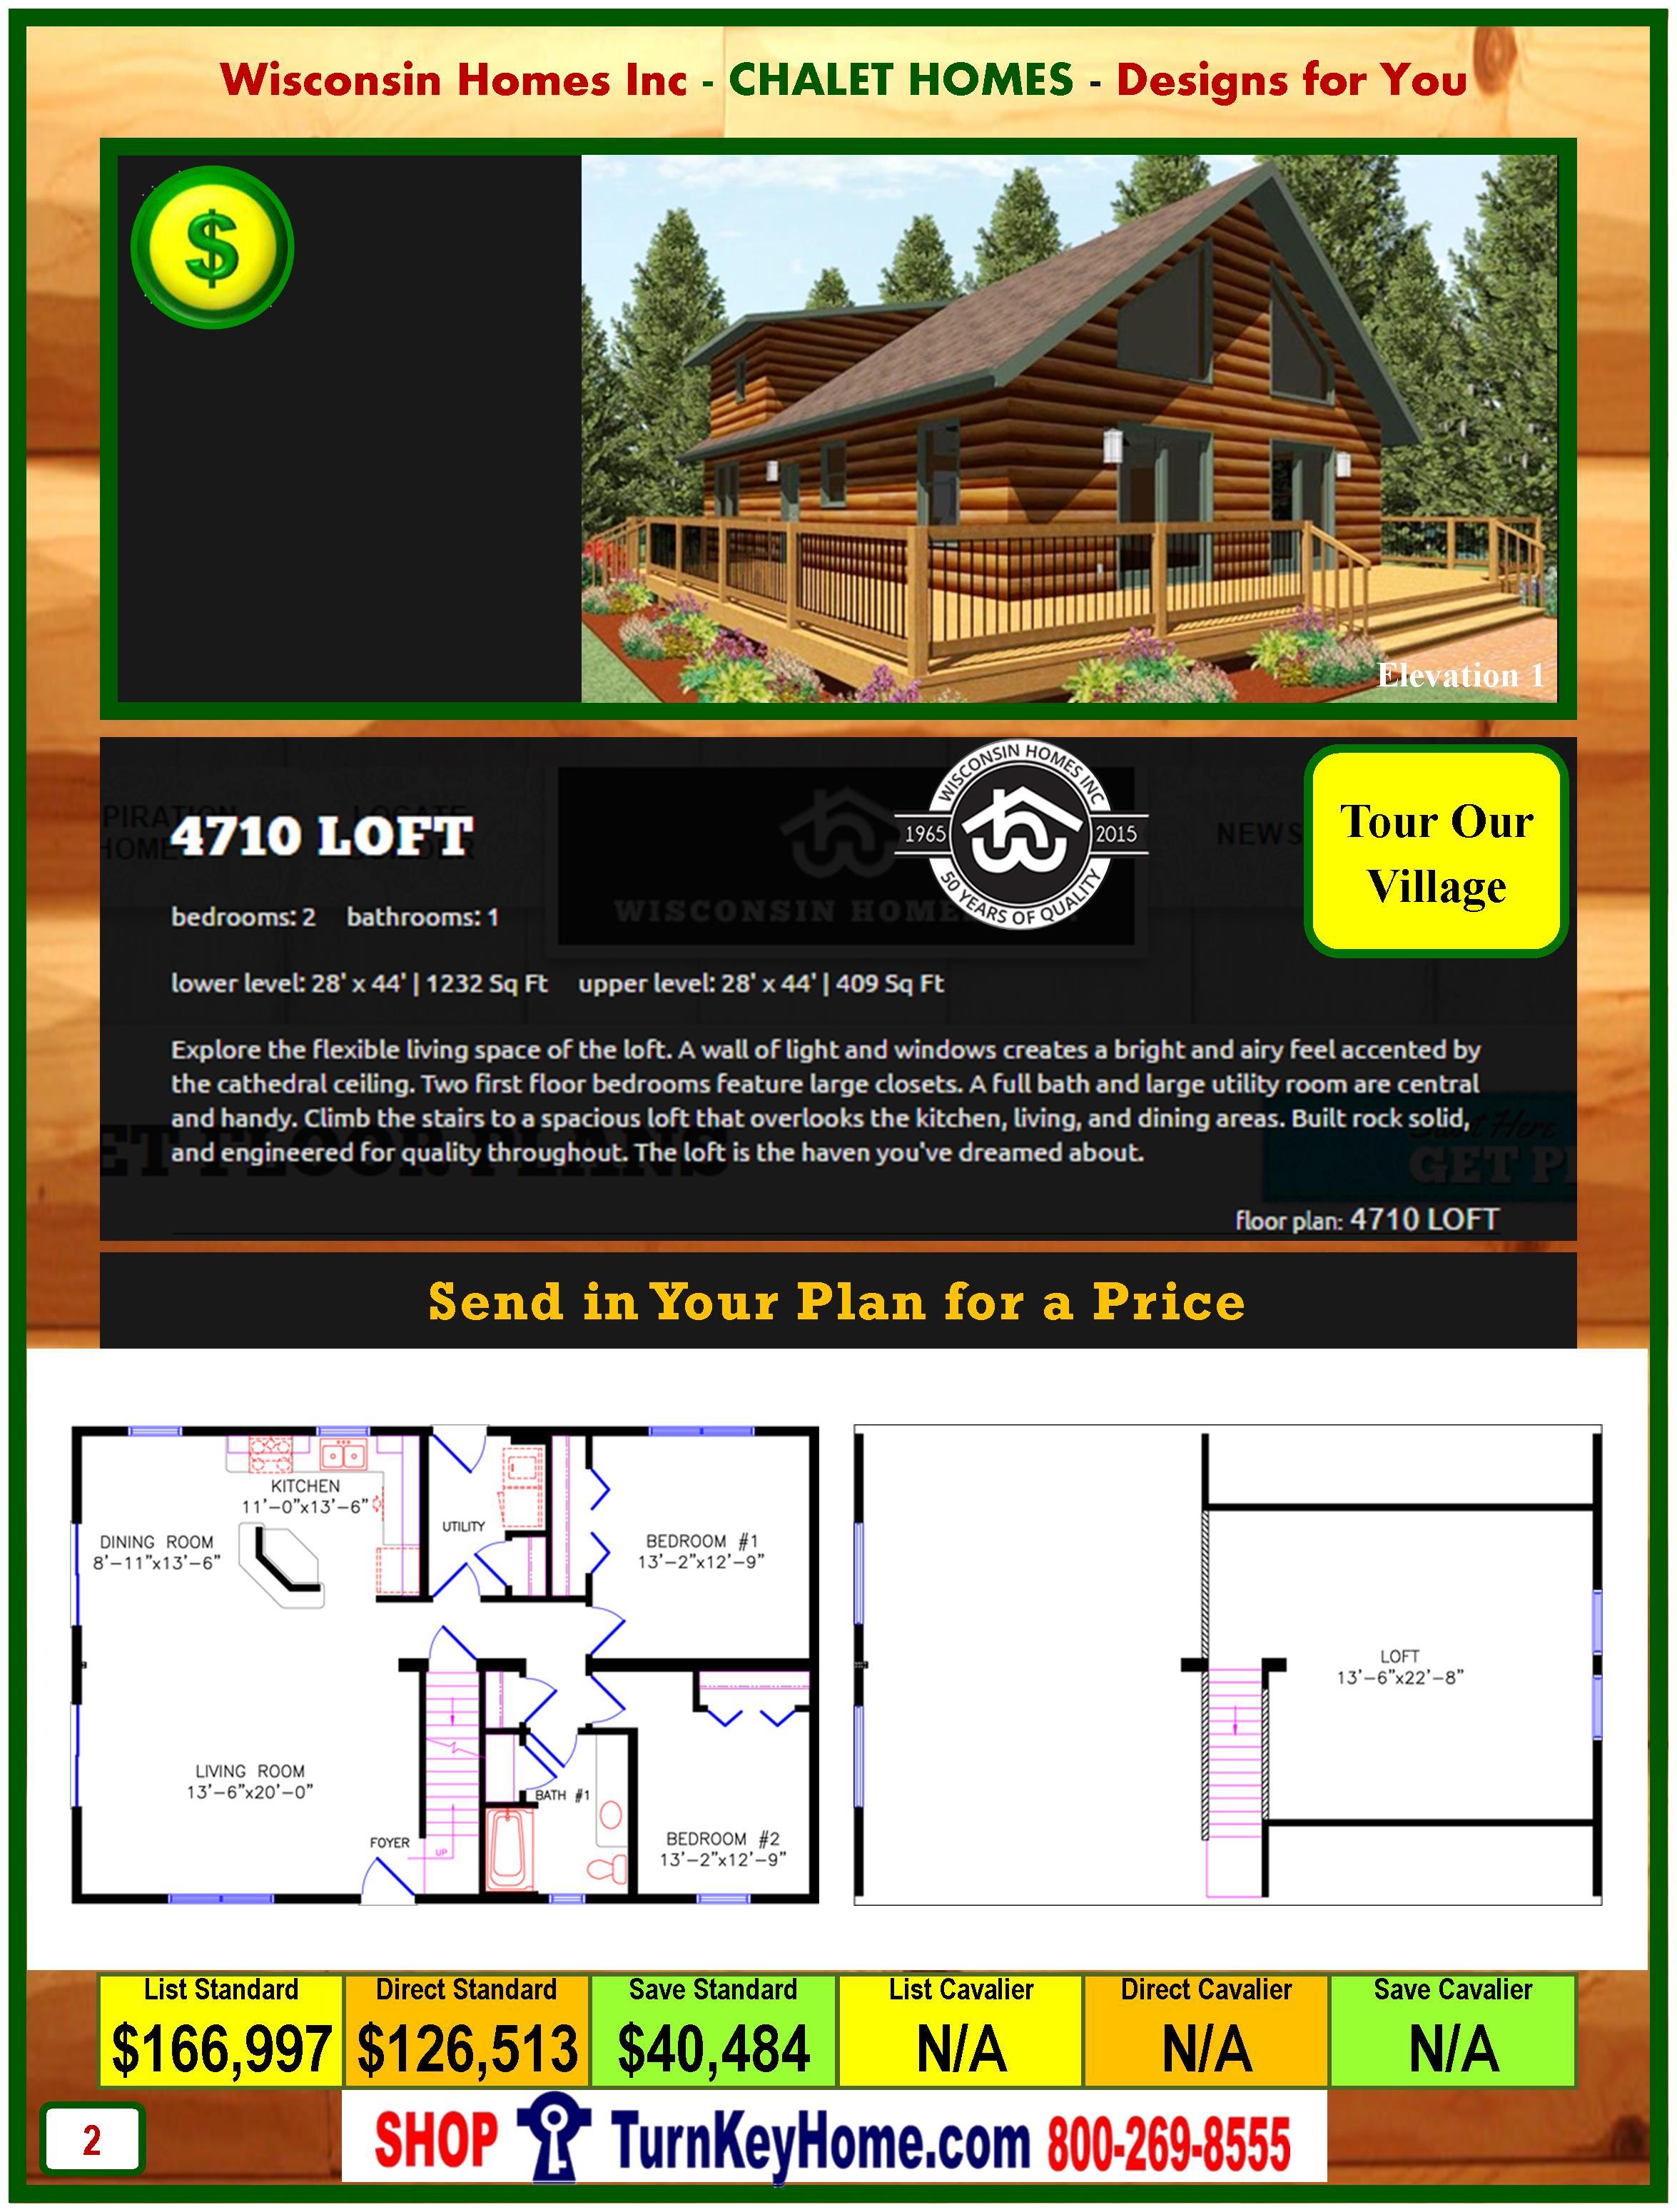 Modular.Home.Catalog.Wisconsin.Homes.Inc.Chalet.Loft.4710.1.P2.1215